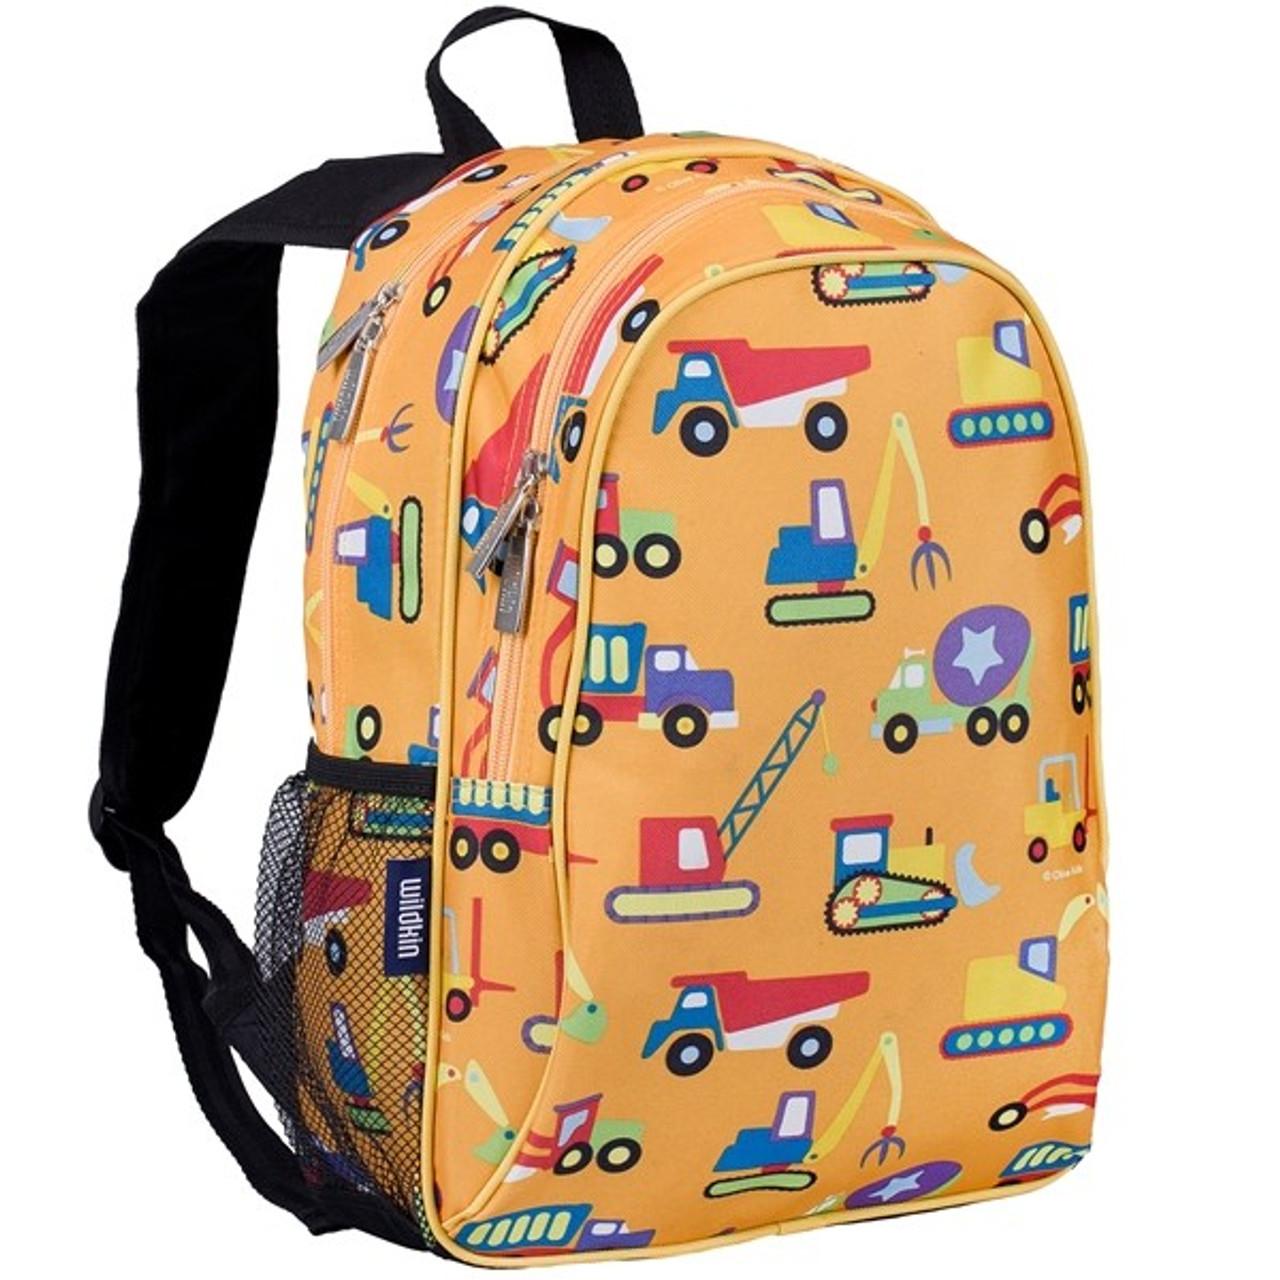 dbd3ba7ab99a Wildkin Olive Kids Backpack with Side Pocket - Construction